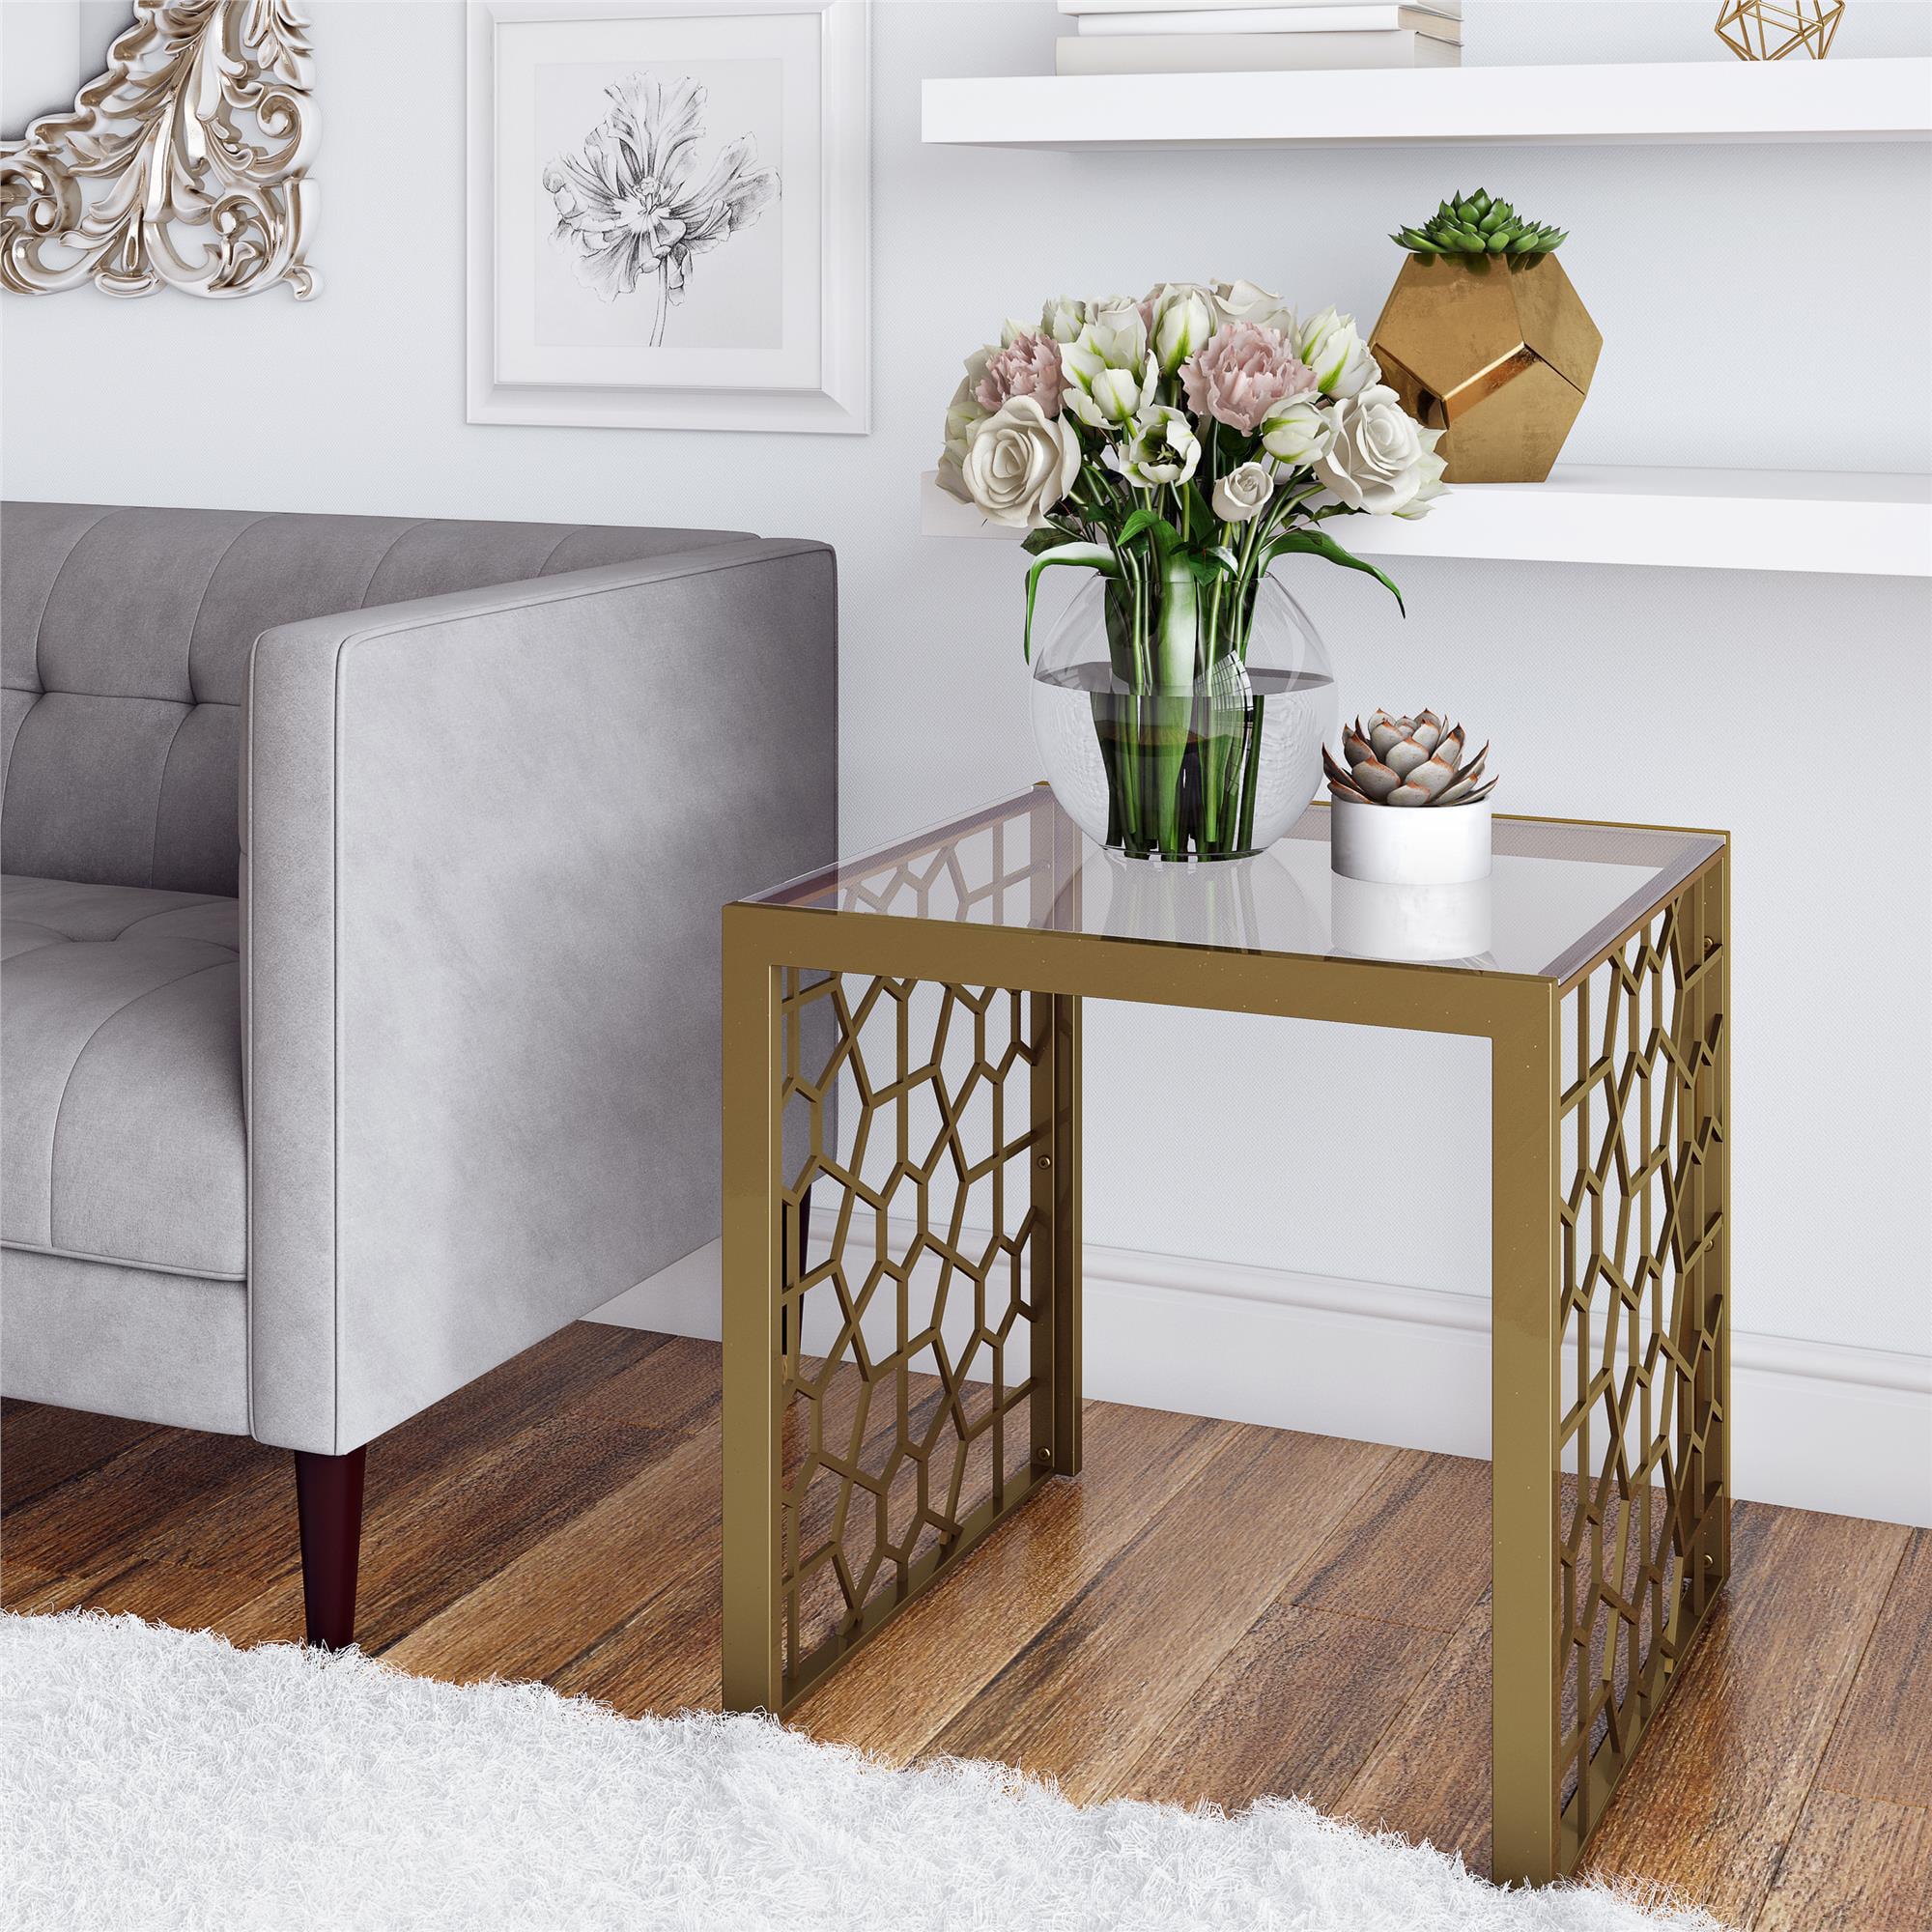 Cosmoliving Juliette Side Table Living Room Brass Tempered Glass Walmart Com Walmart Com